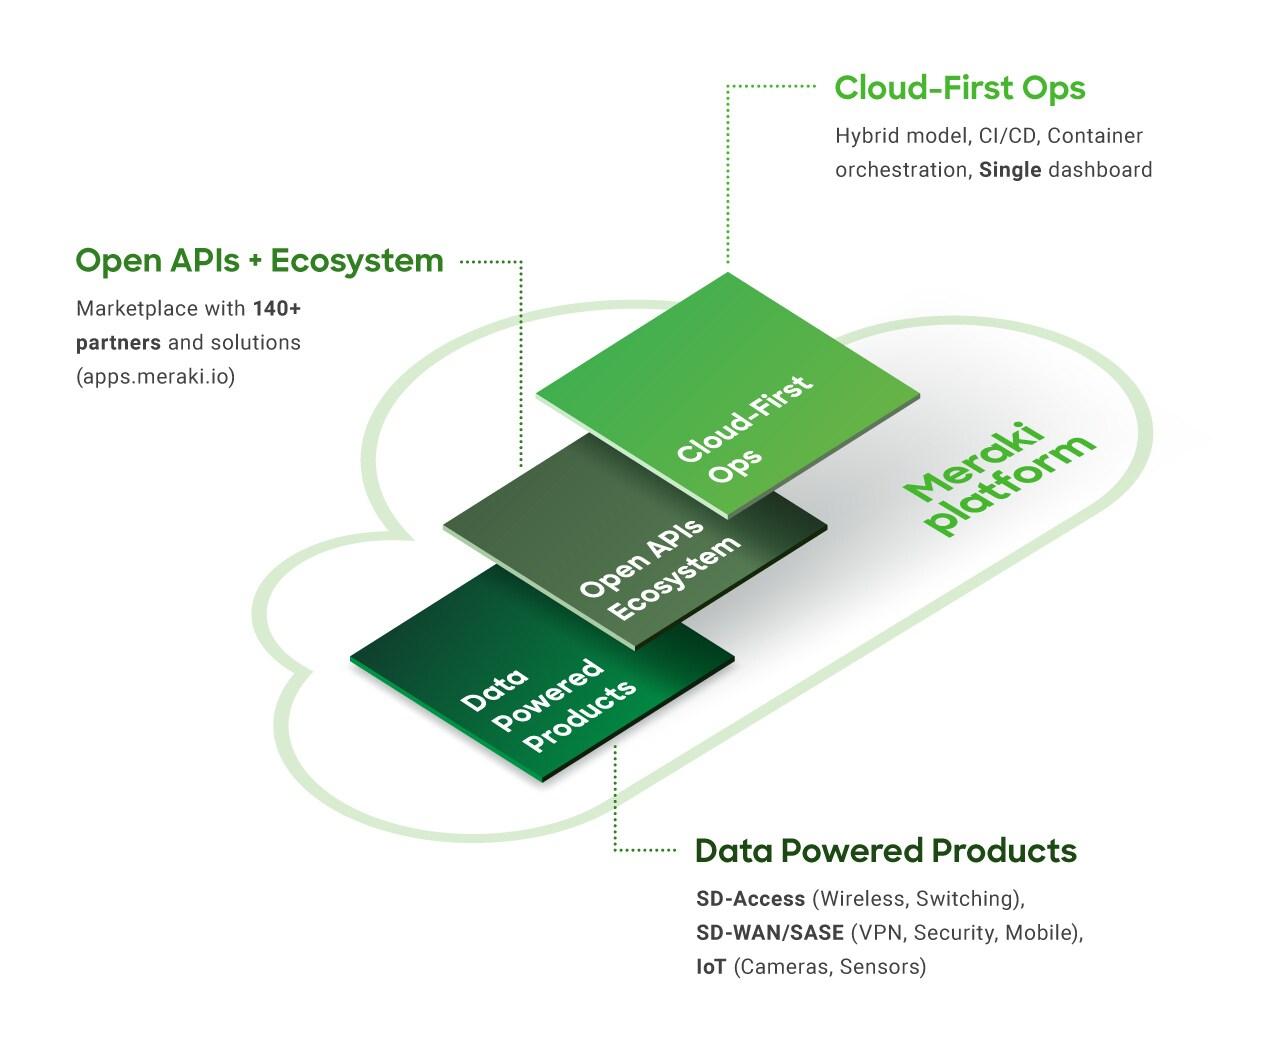 Infograpic - Open APIs + Ecosystem